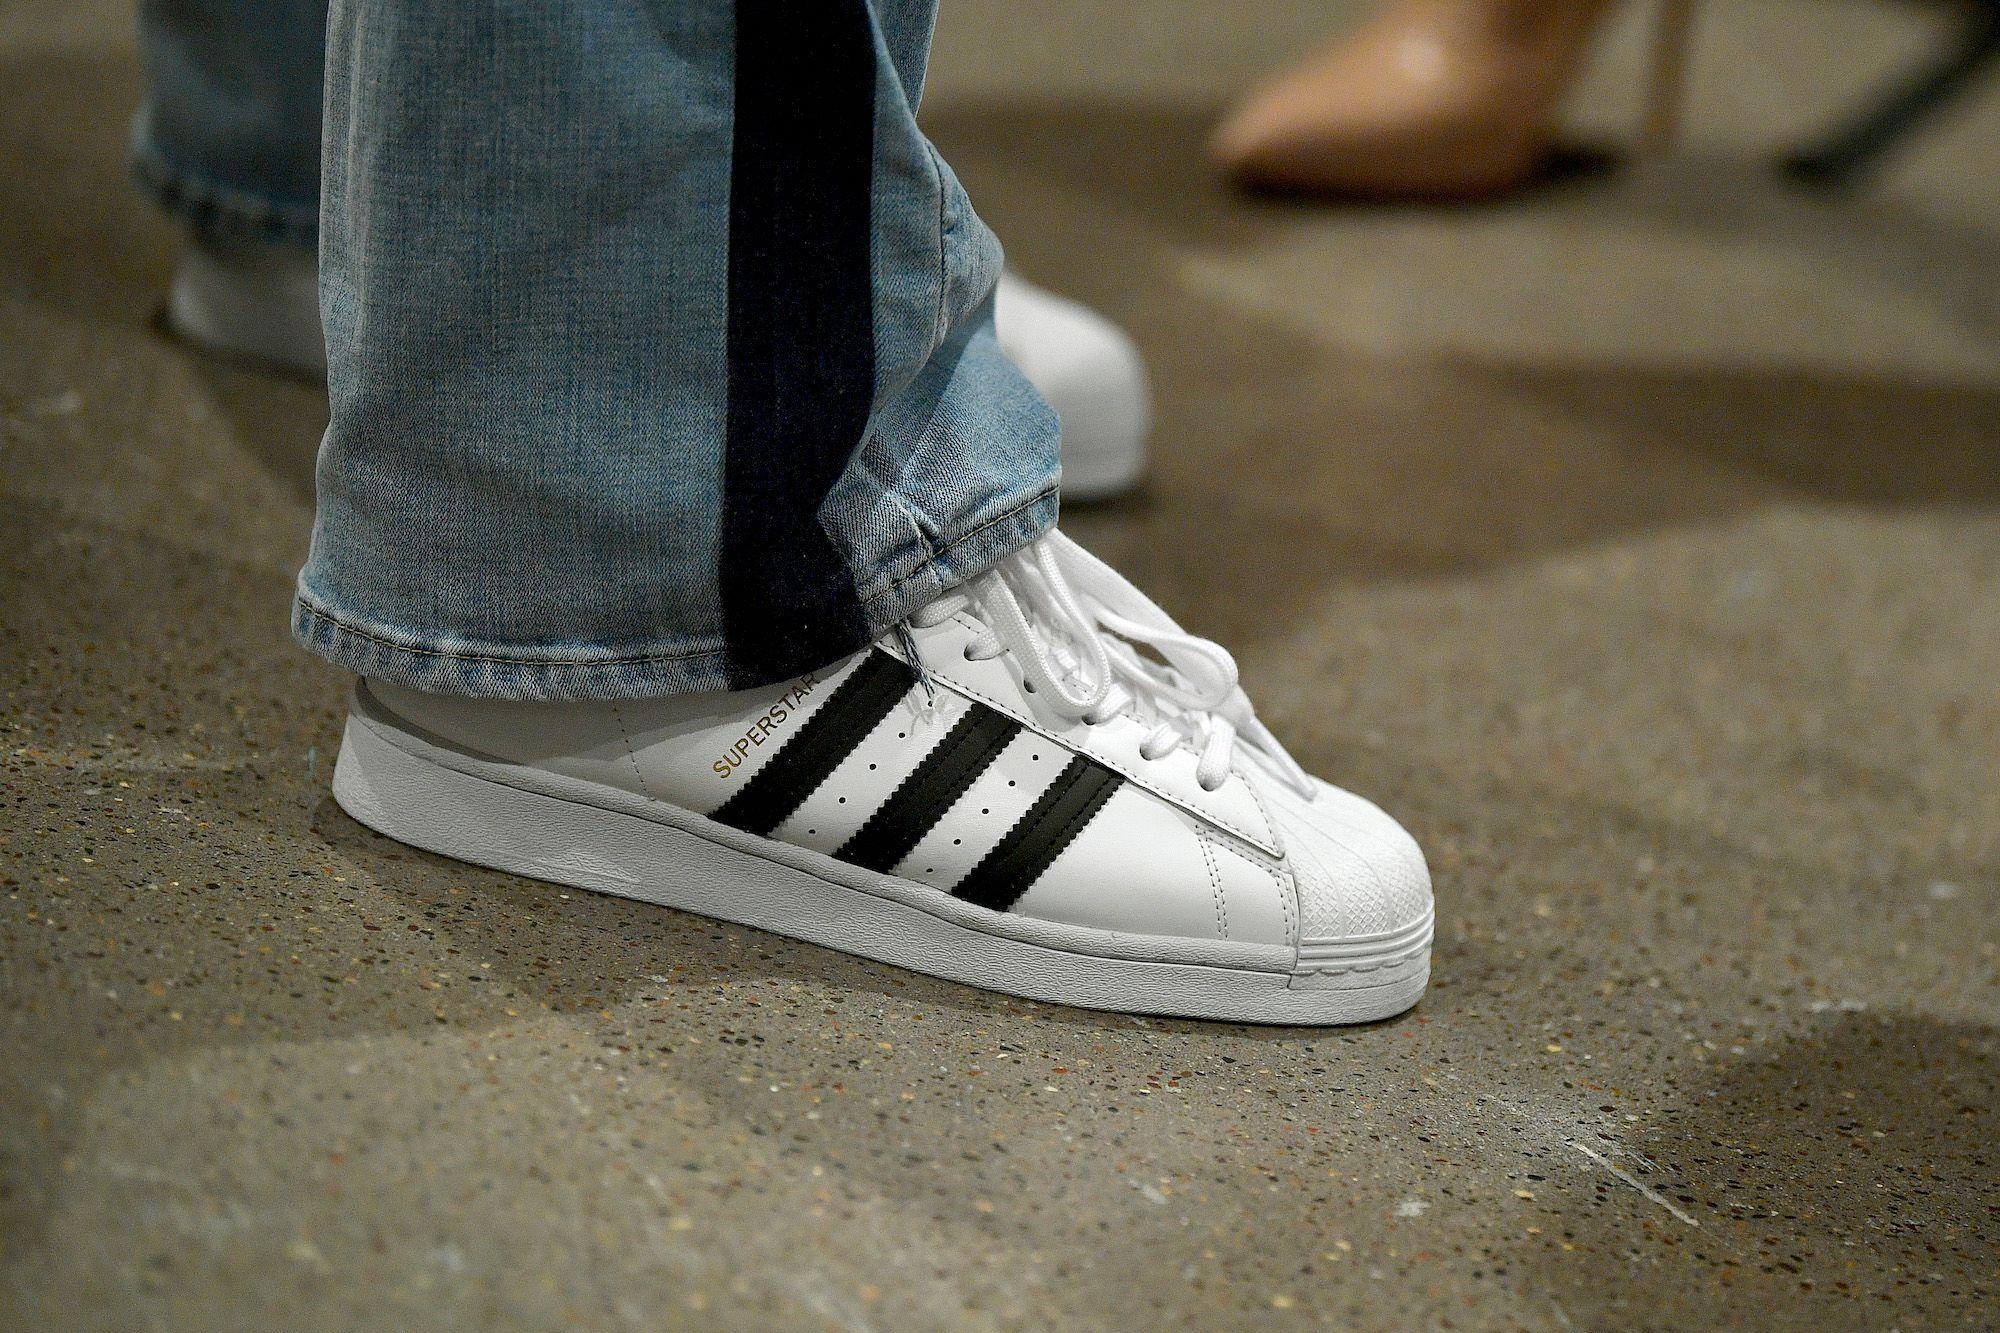 Coronavirus : les ventes d'Adidas chutent de 85% en Chine